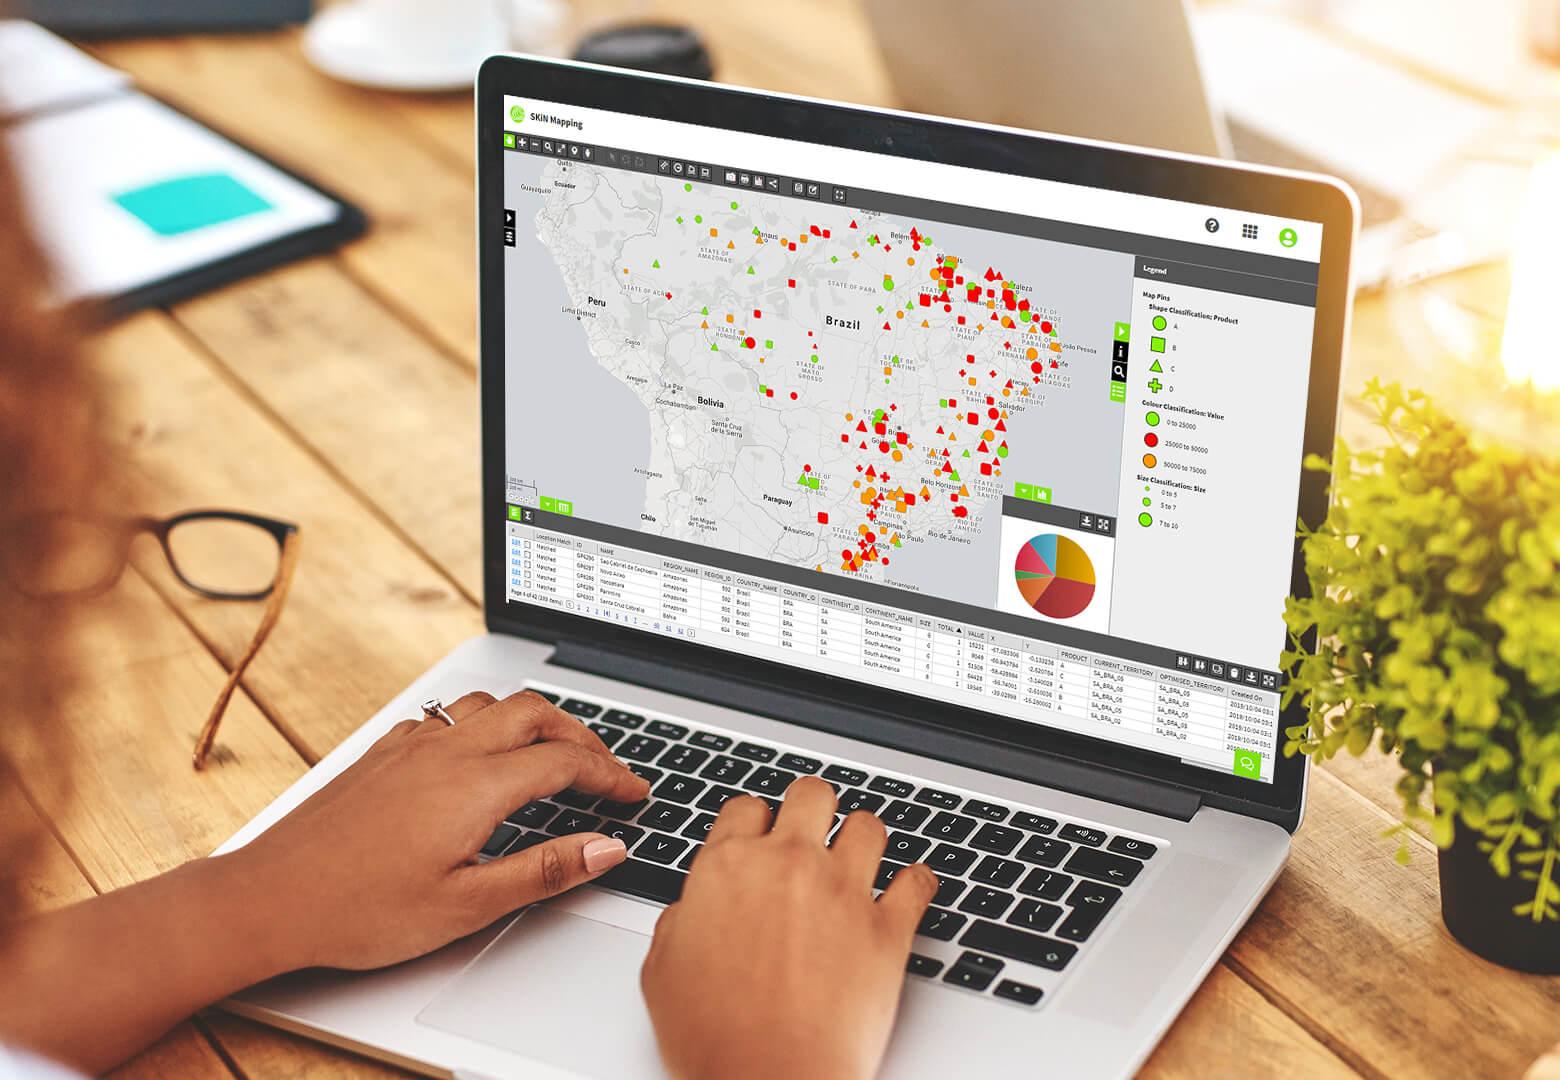 monitoring key locations on laptop